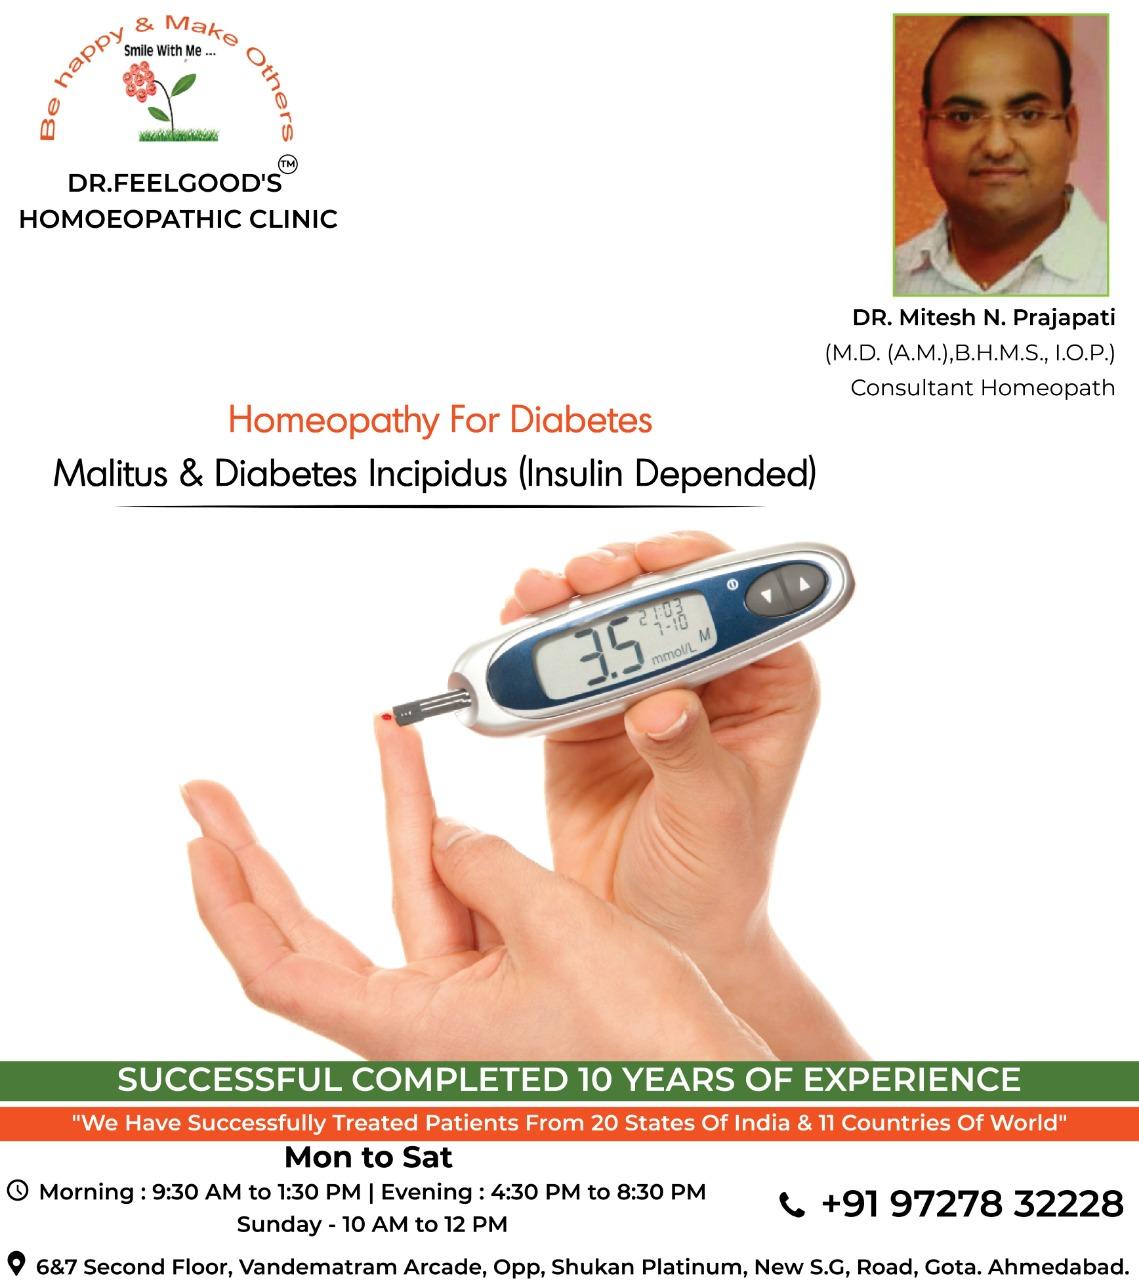 DR.MITESH PRAJAPATI- HOMEOPATHY FOR DIABETES (4)